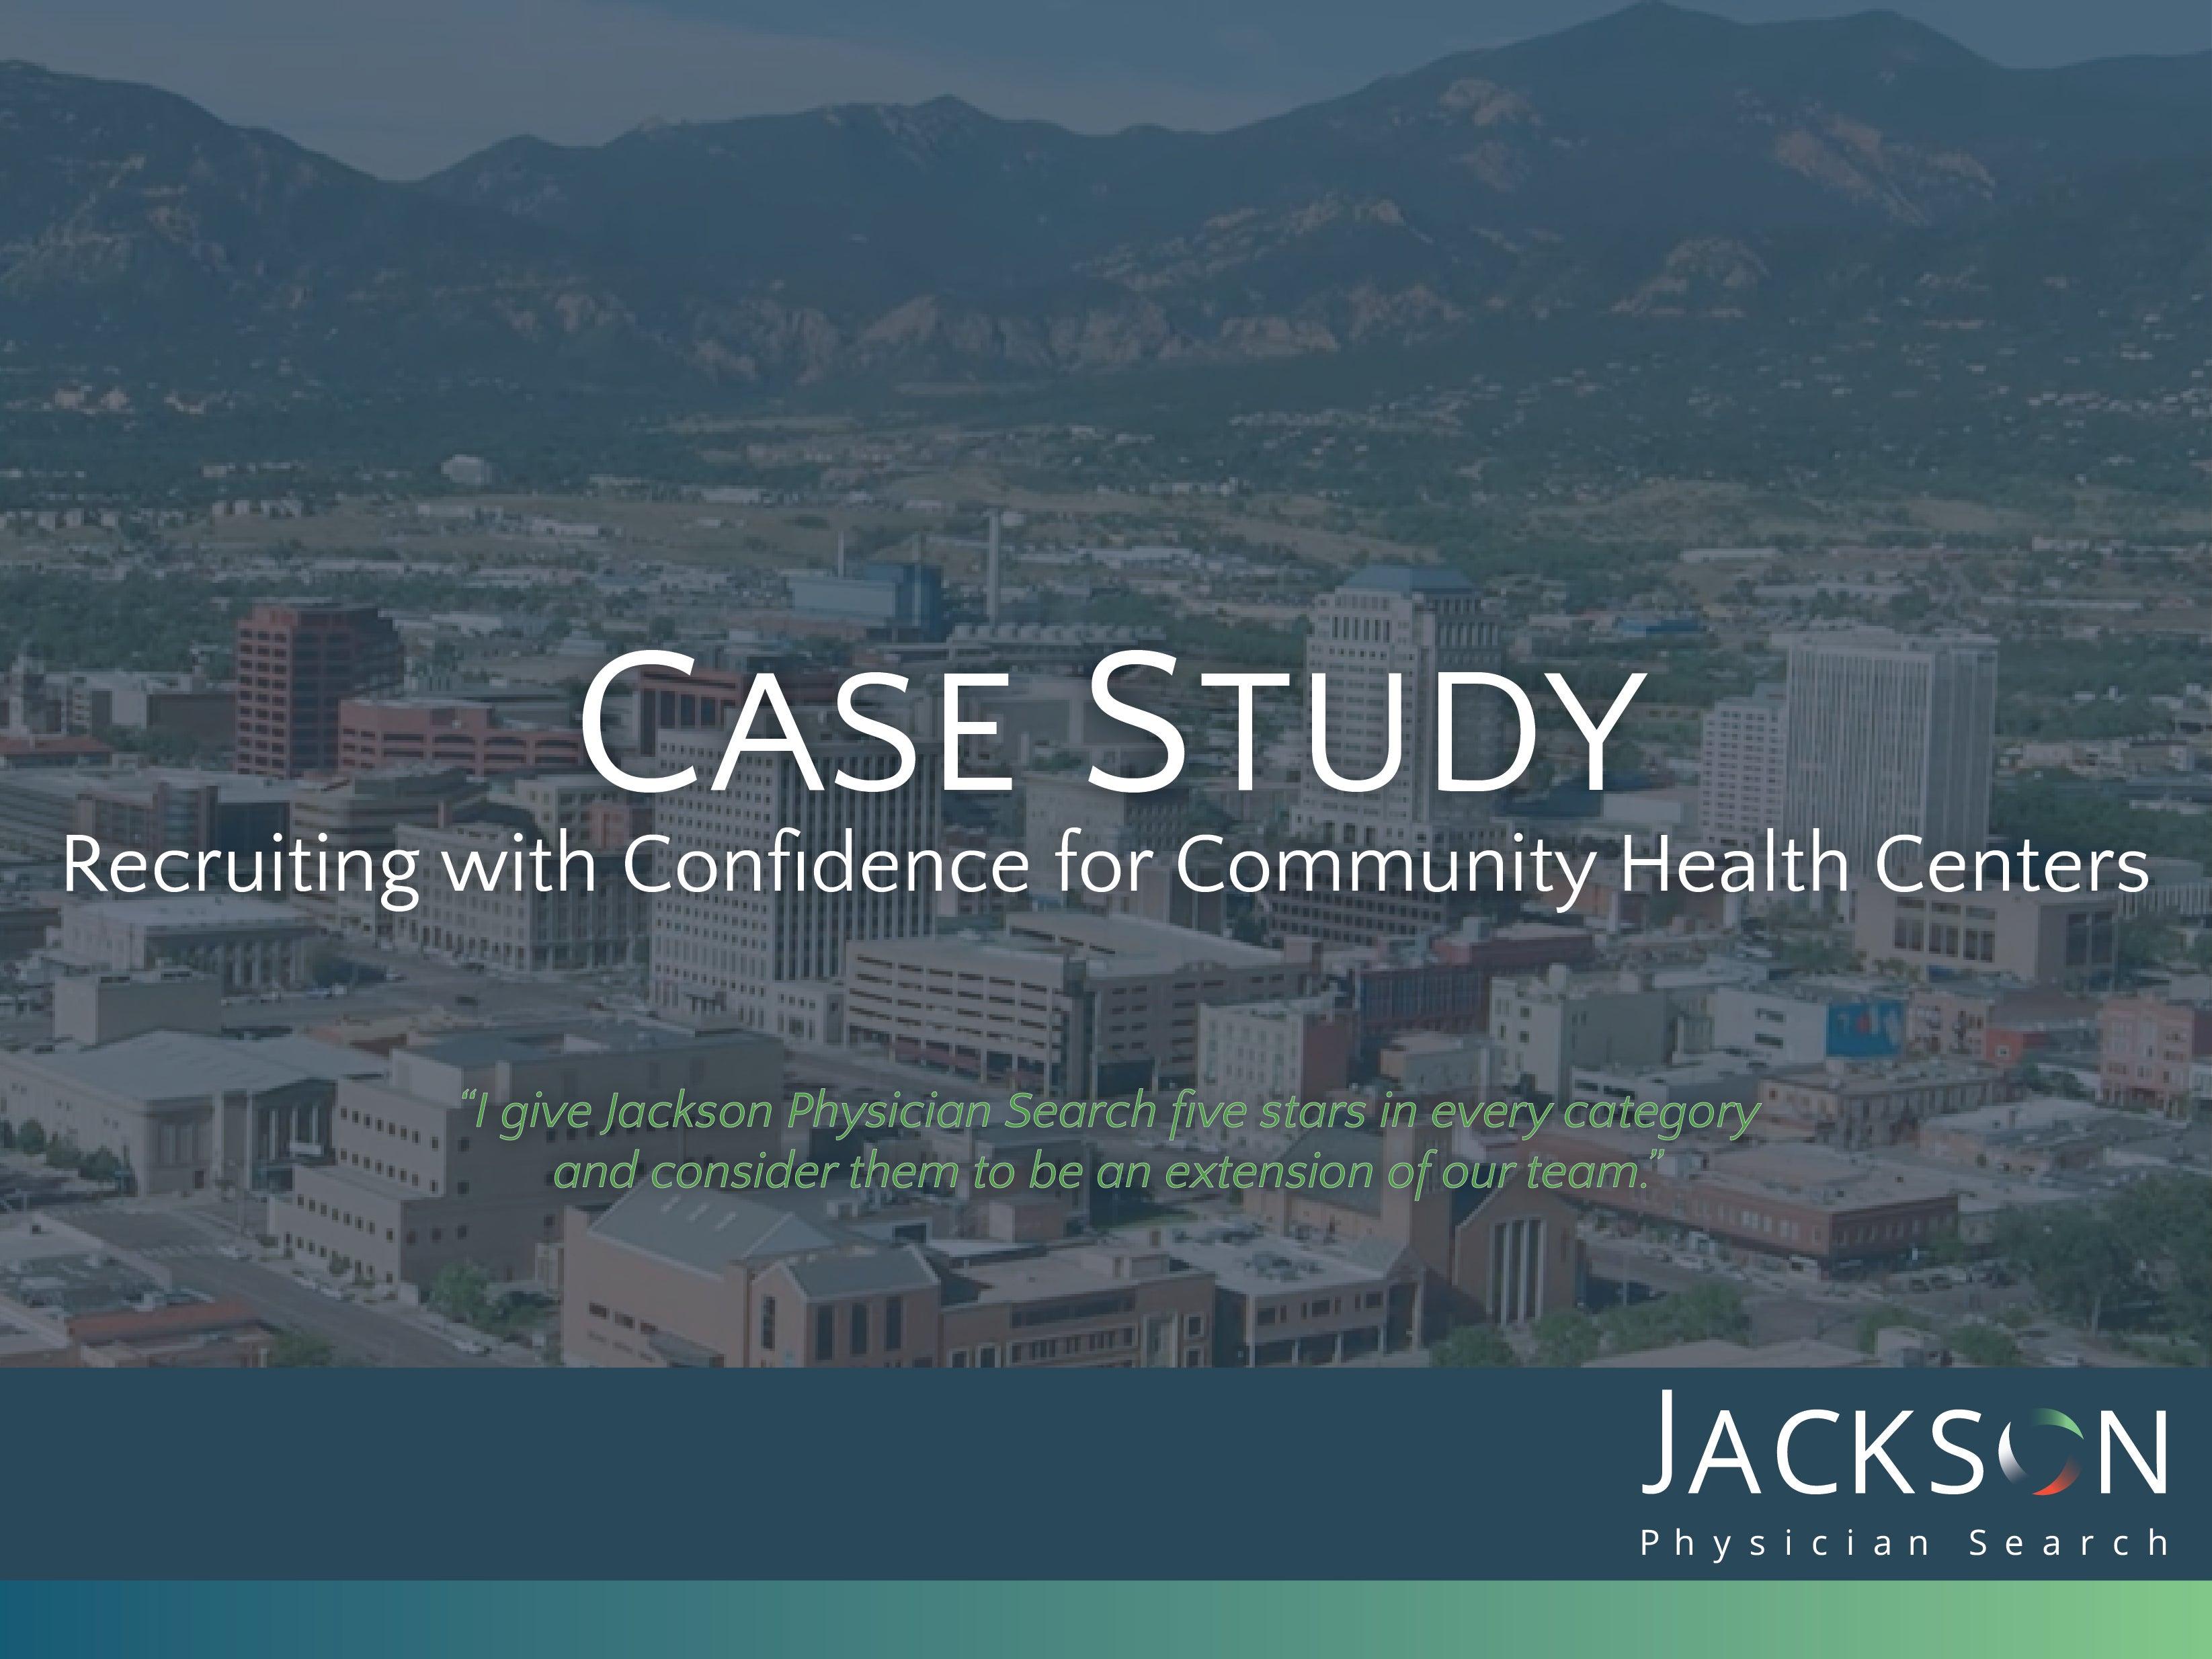 Case Study success recruiting physicians